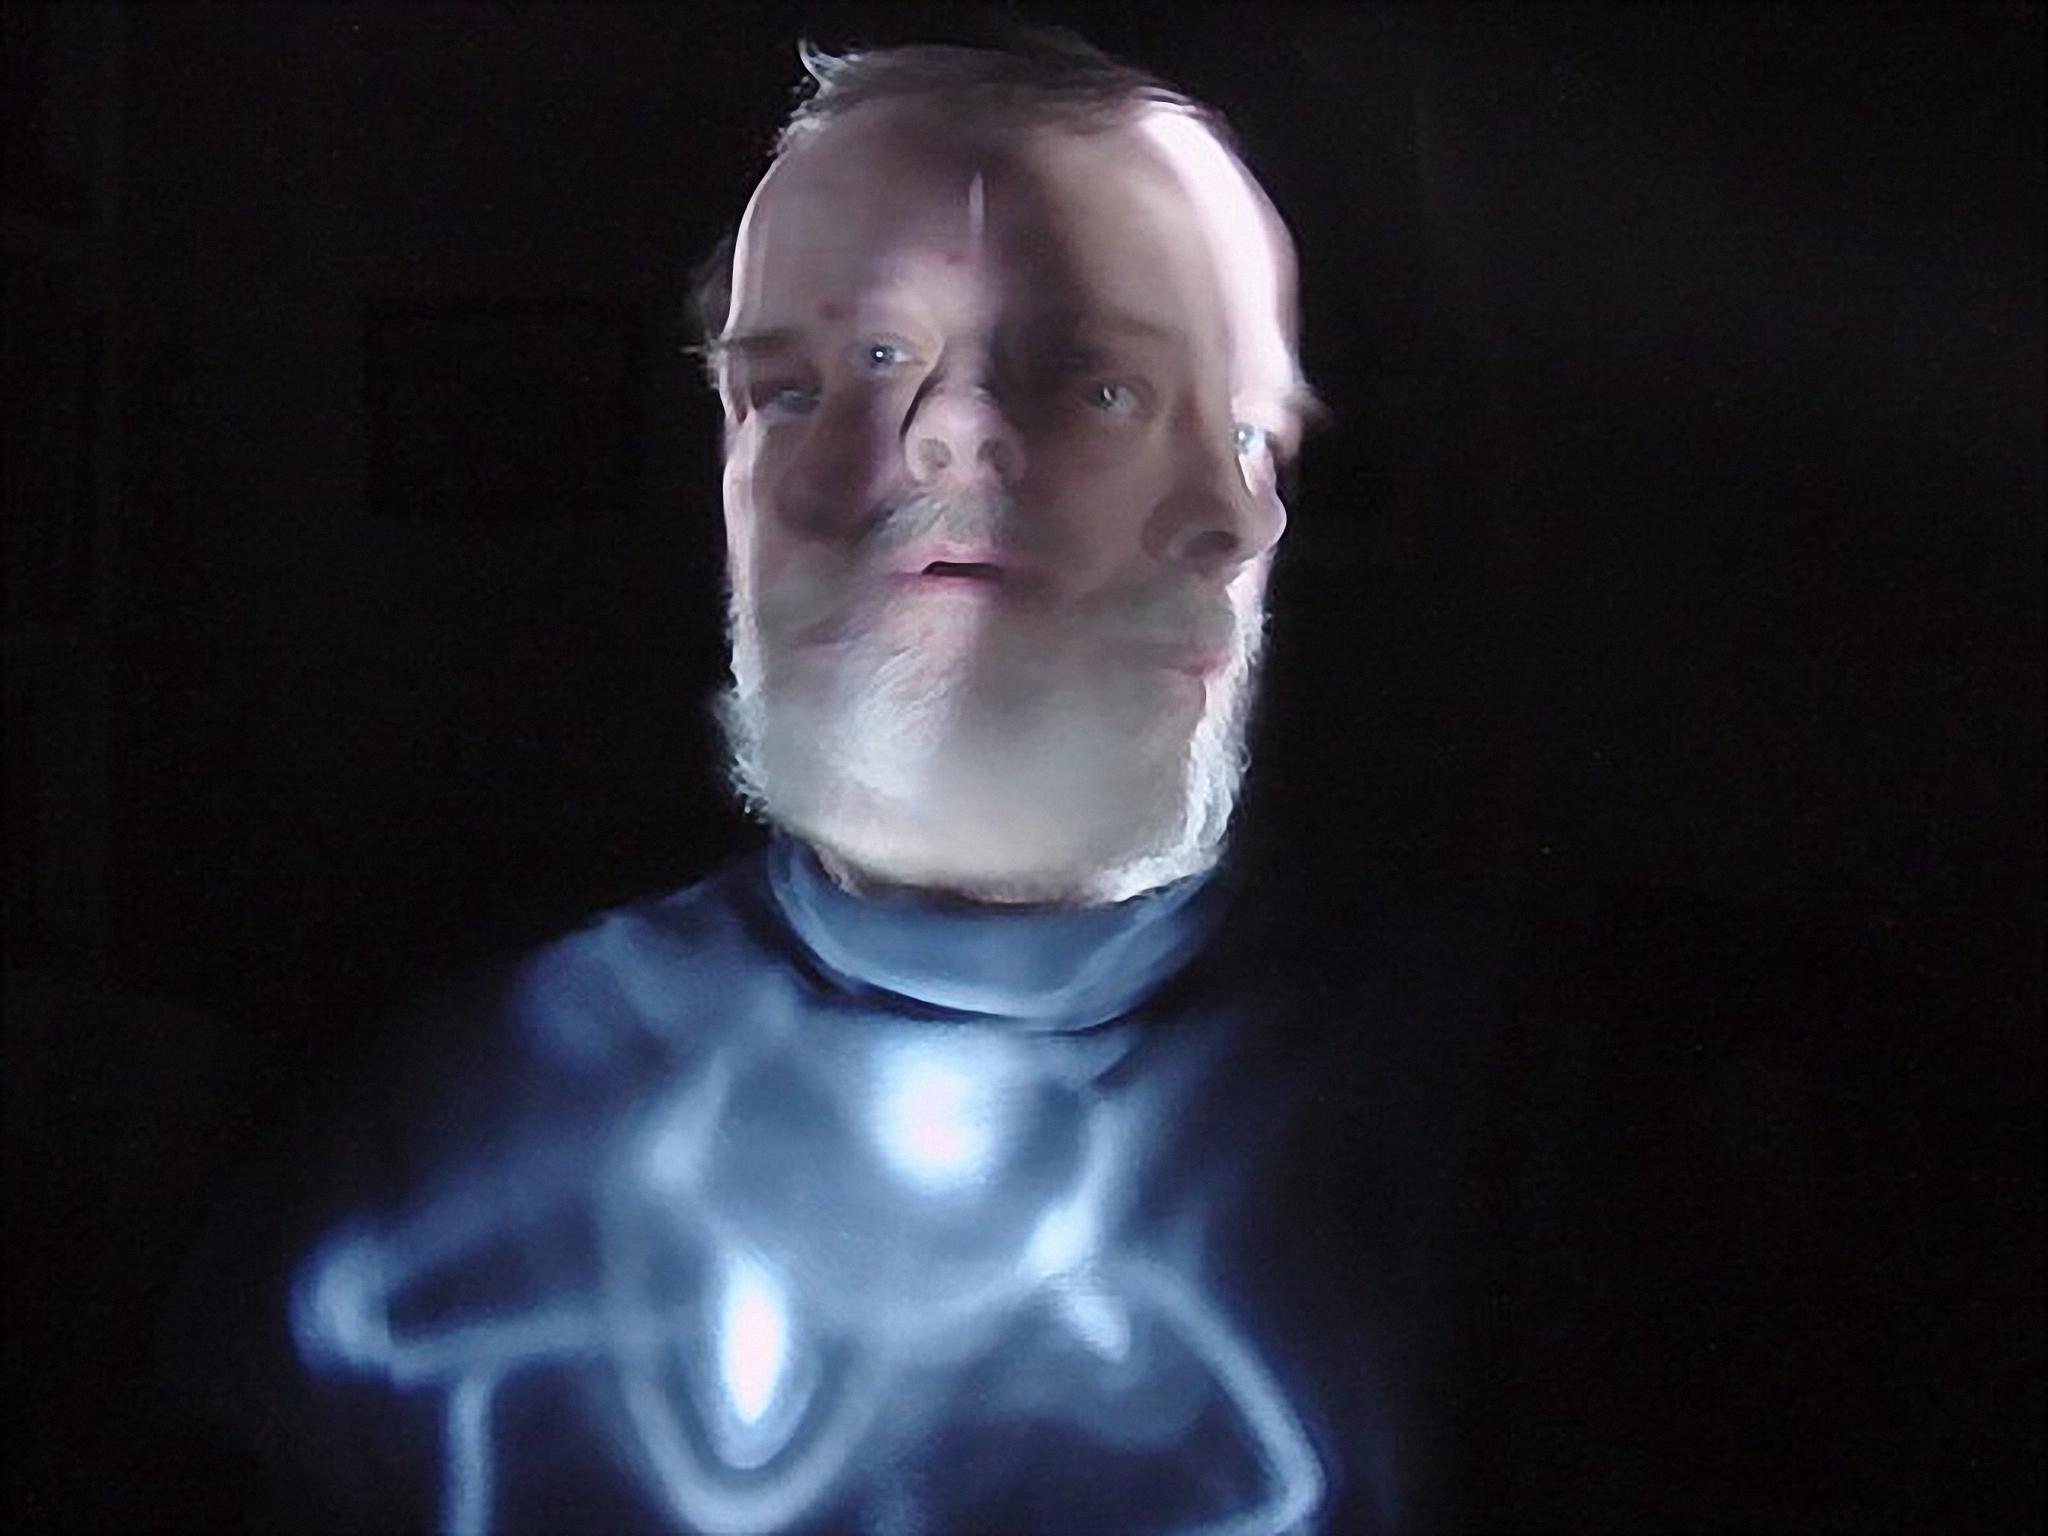 Portrait Lighting Effects